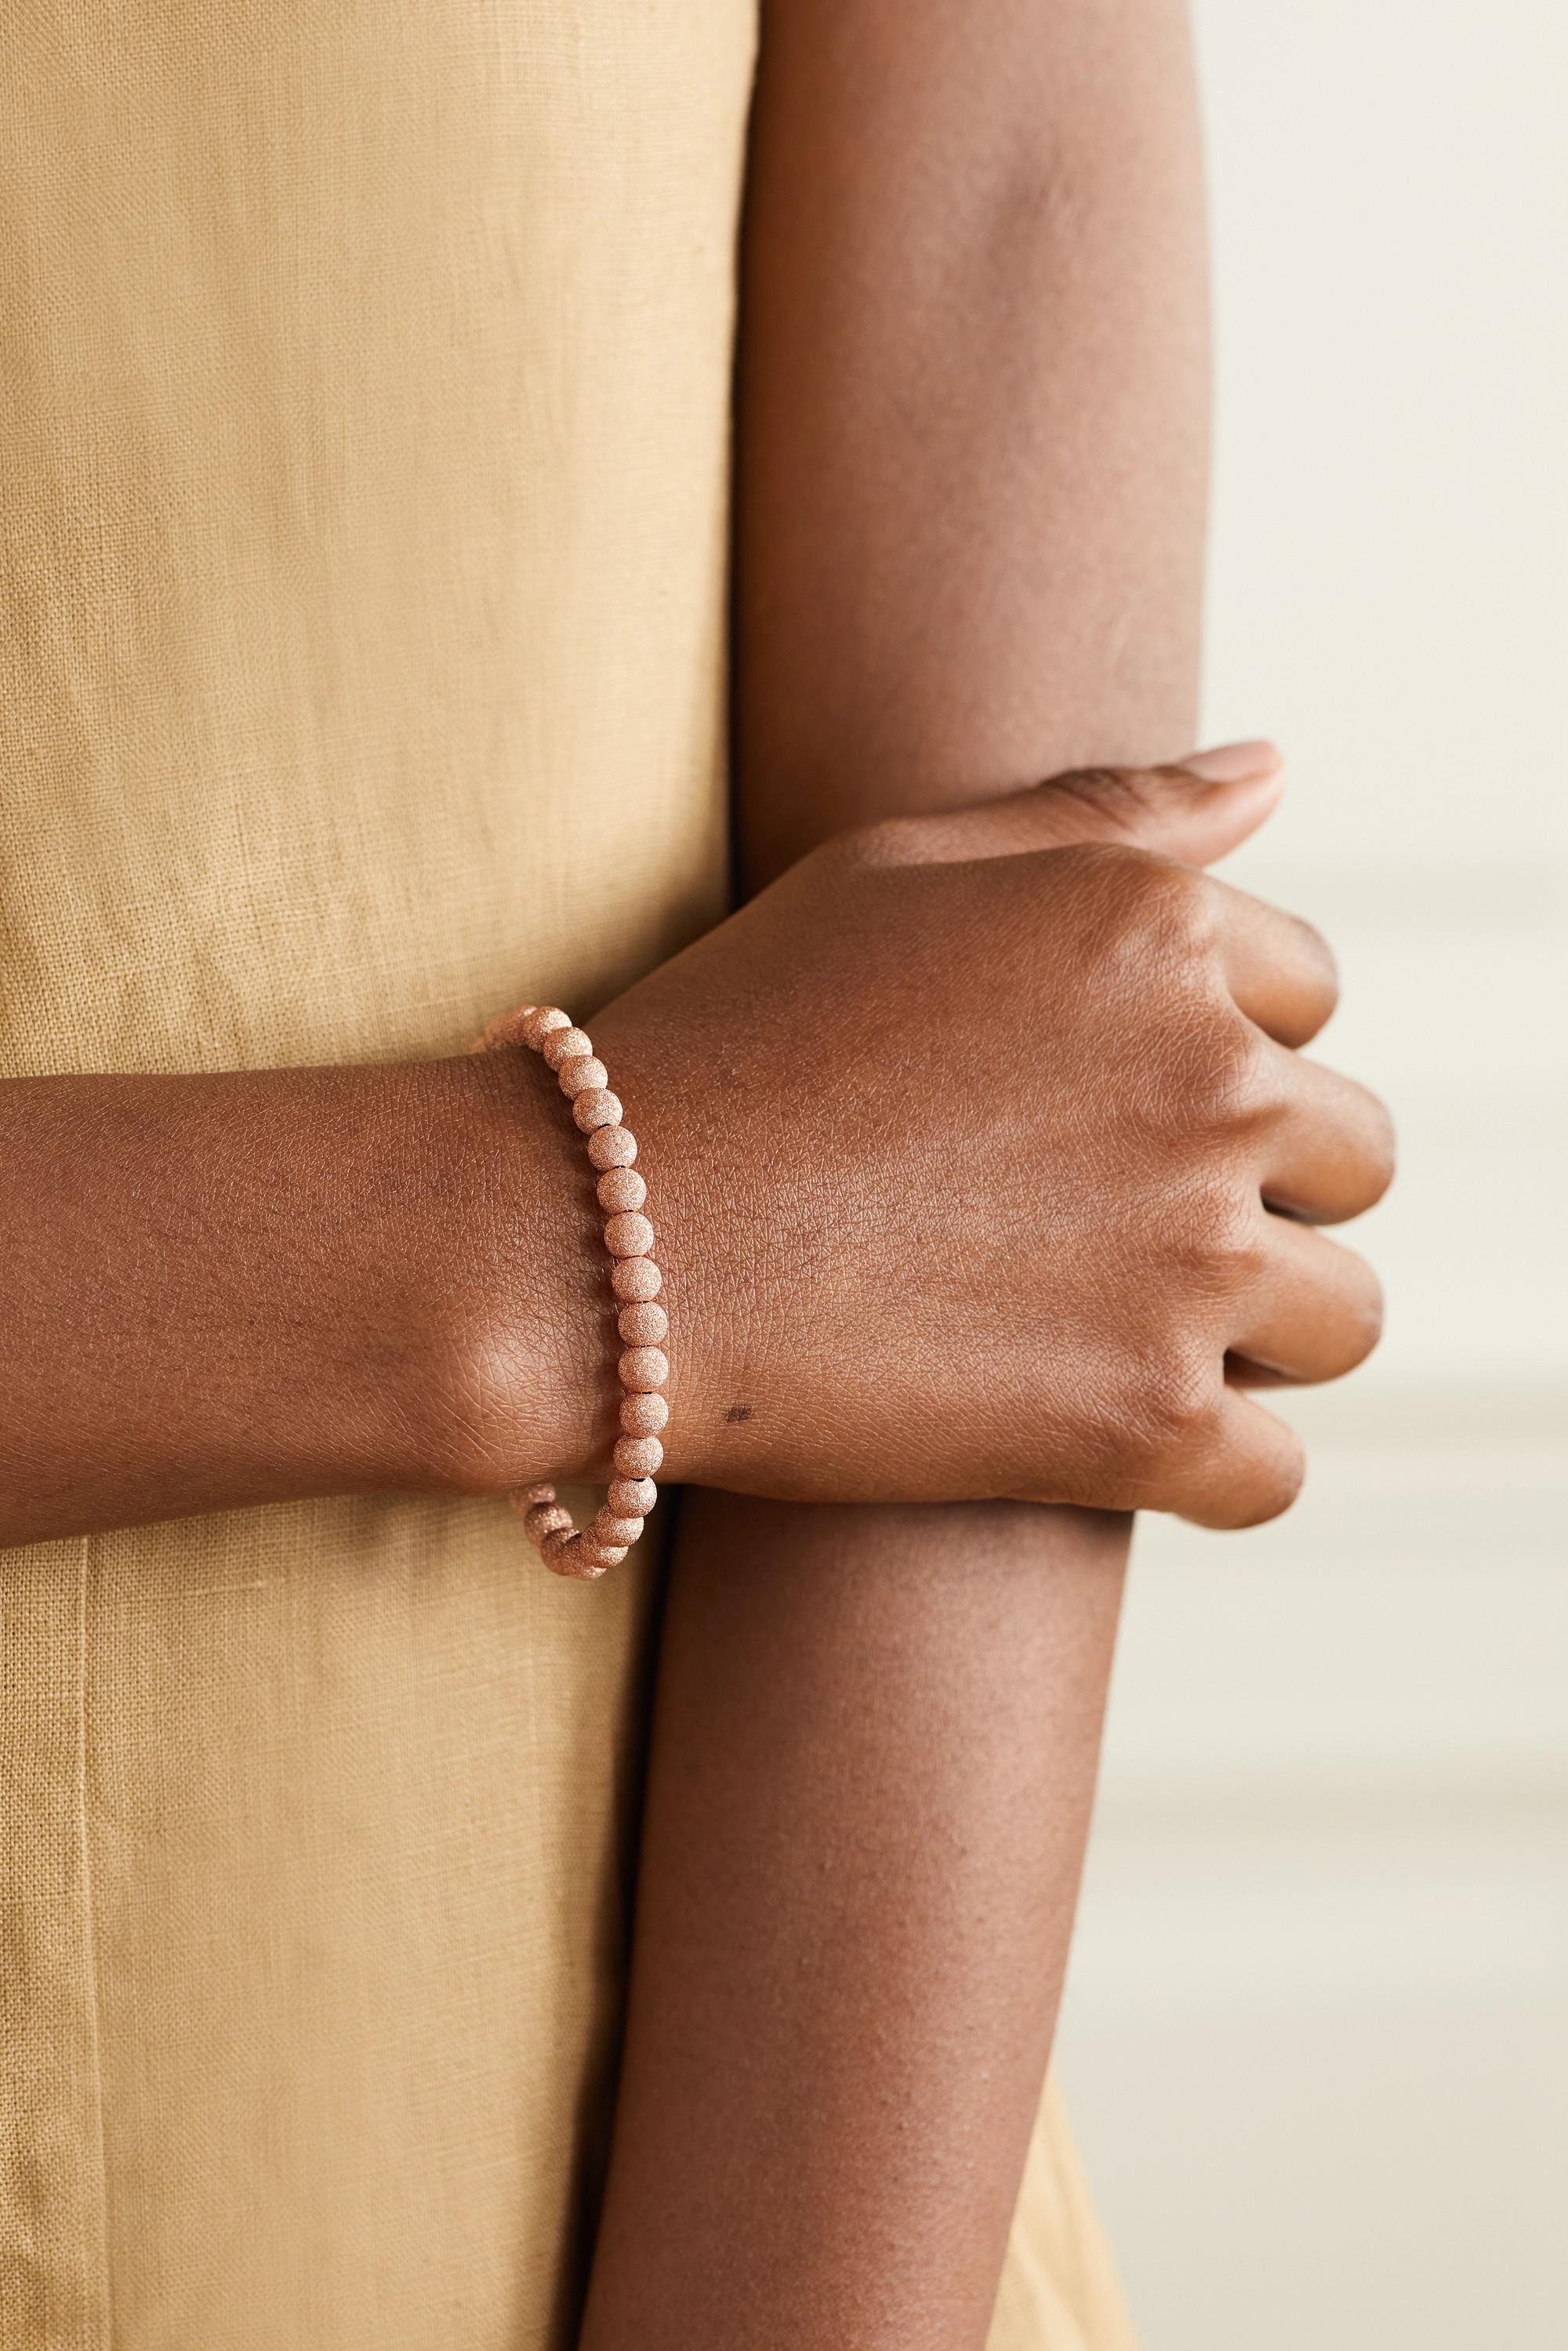 Carolina Bucci Florentine 18-karat rose gold beaded bracelet